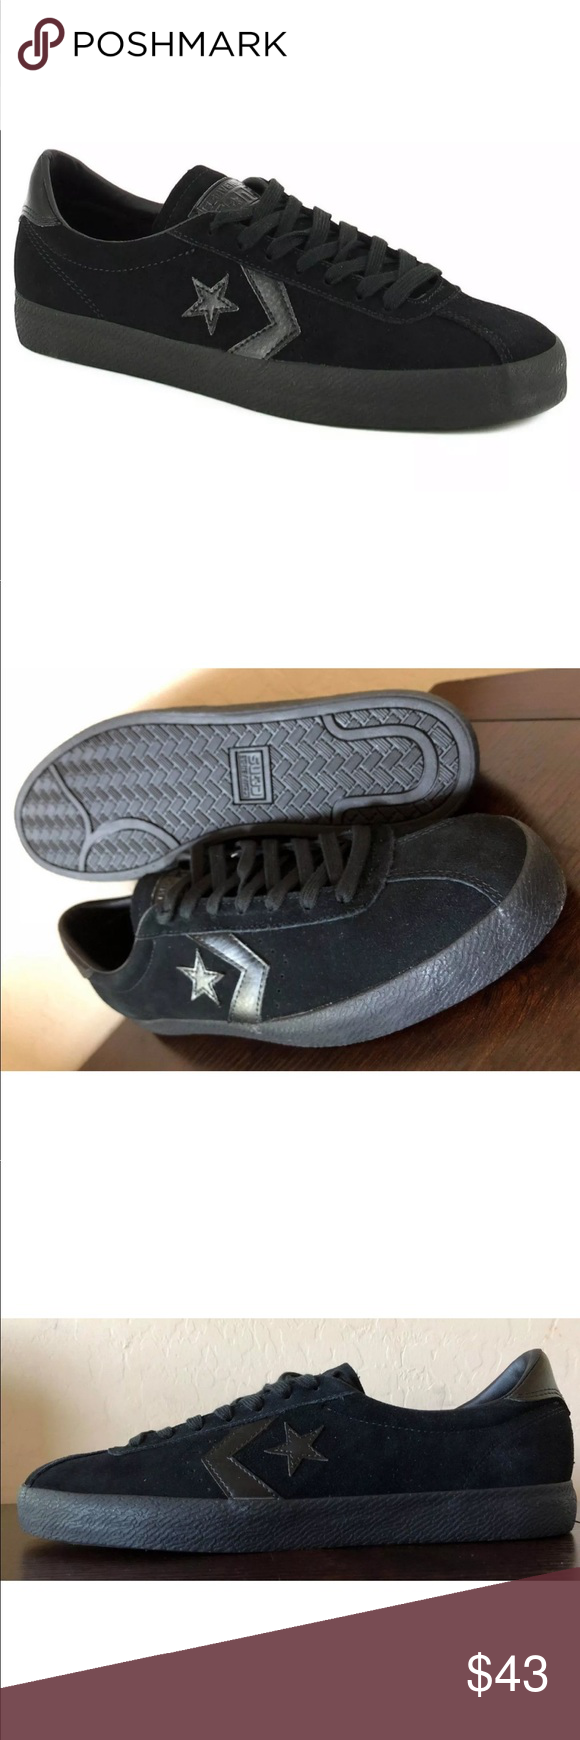 Skate New Breakpoint Shoes Converse Suede Cons Authentic Men's pLzVqMGjSU